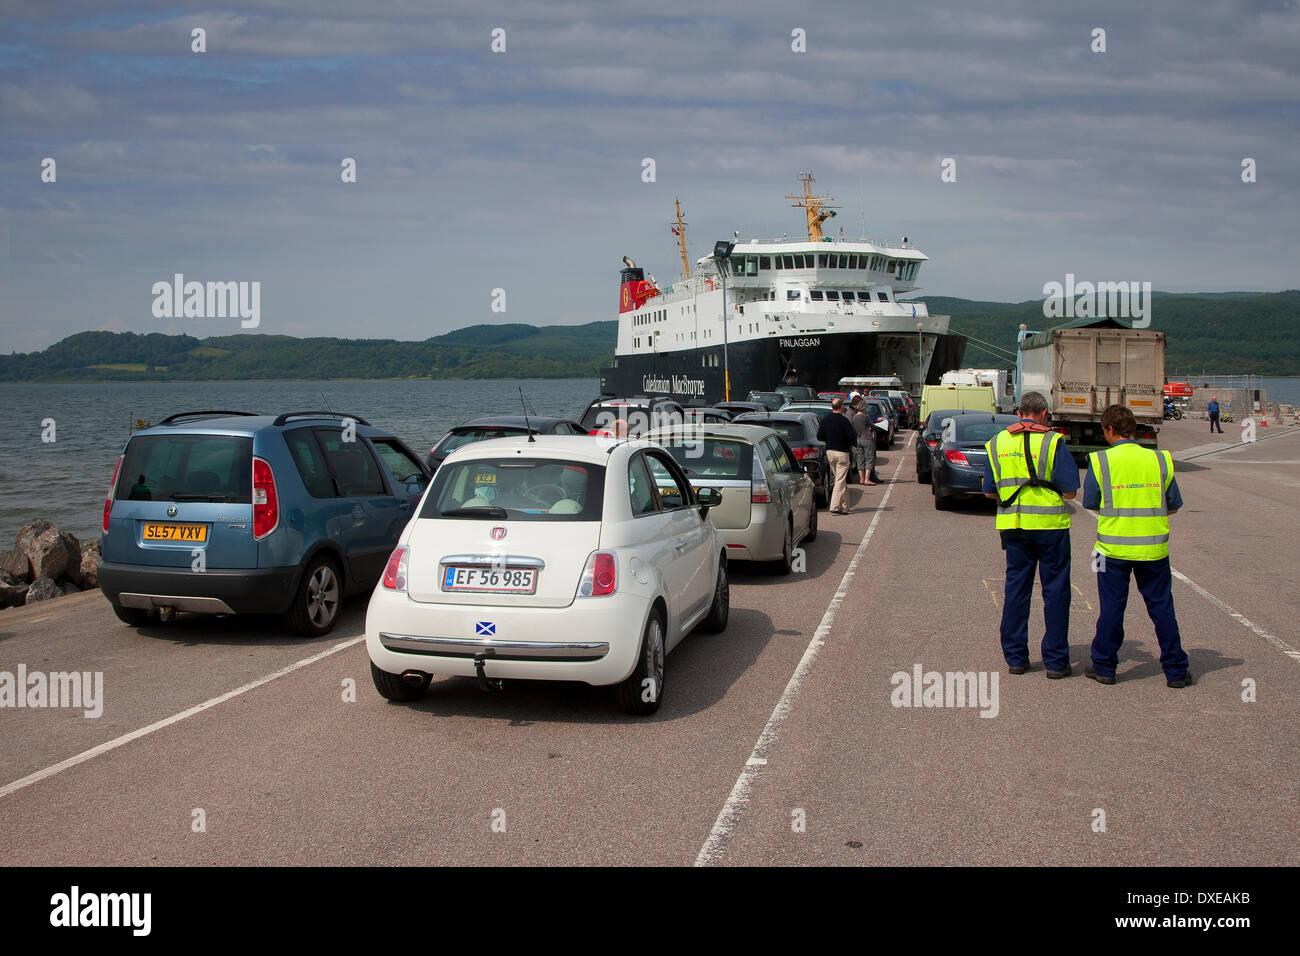 cars being loaded onto Caledoniann MacBrayne vessel 'MV Finlaggan' at Kennicraig Pier, West Loch Tarbert. - Stock Image